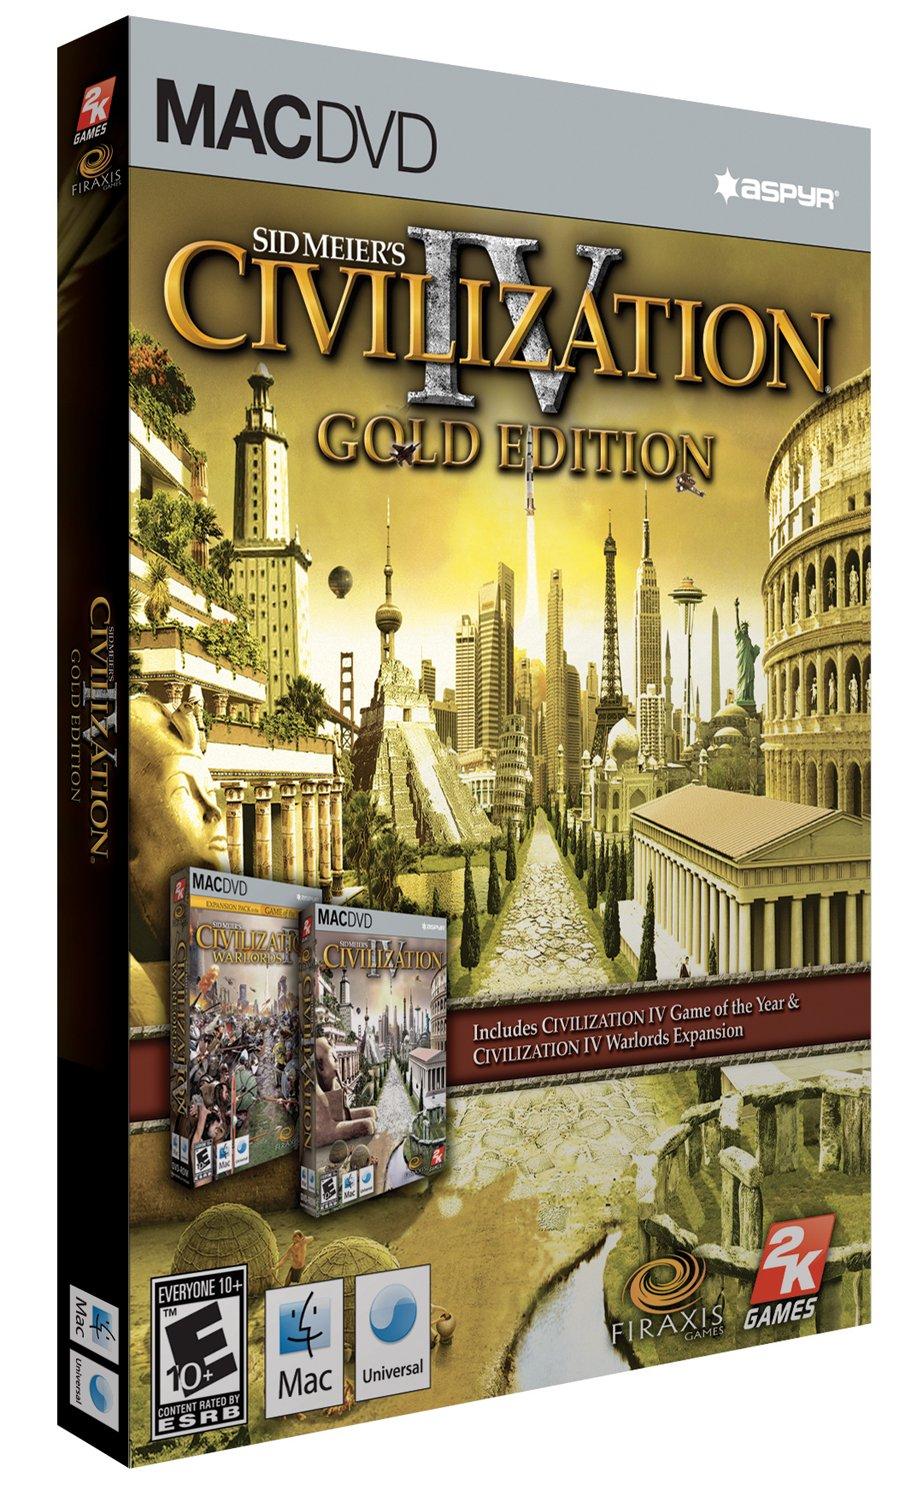 Civilization 4: Gold Edition - Mac